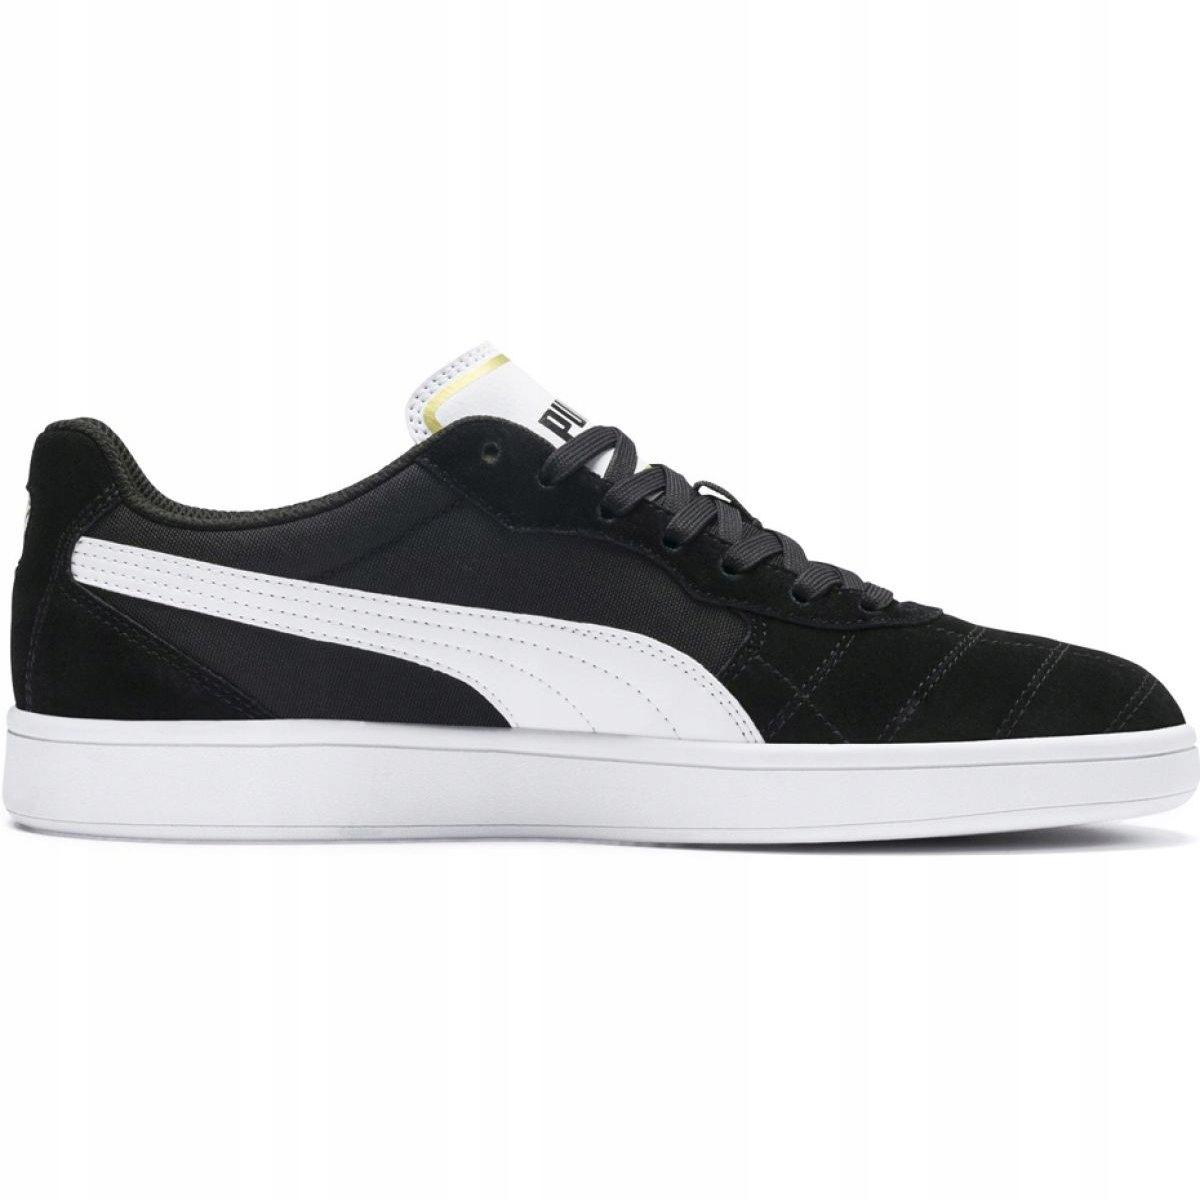 Buty Puma Astro Kick M 369115 01 r.44